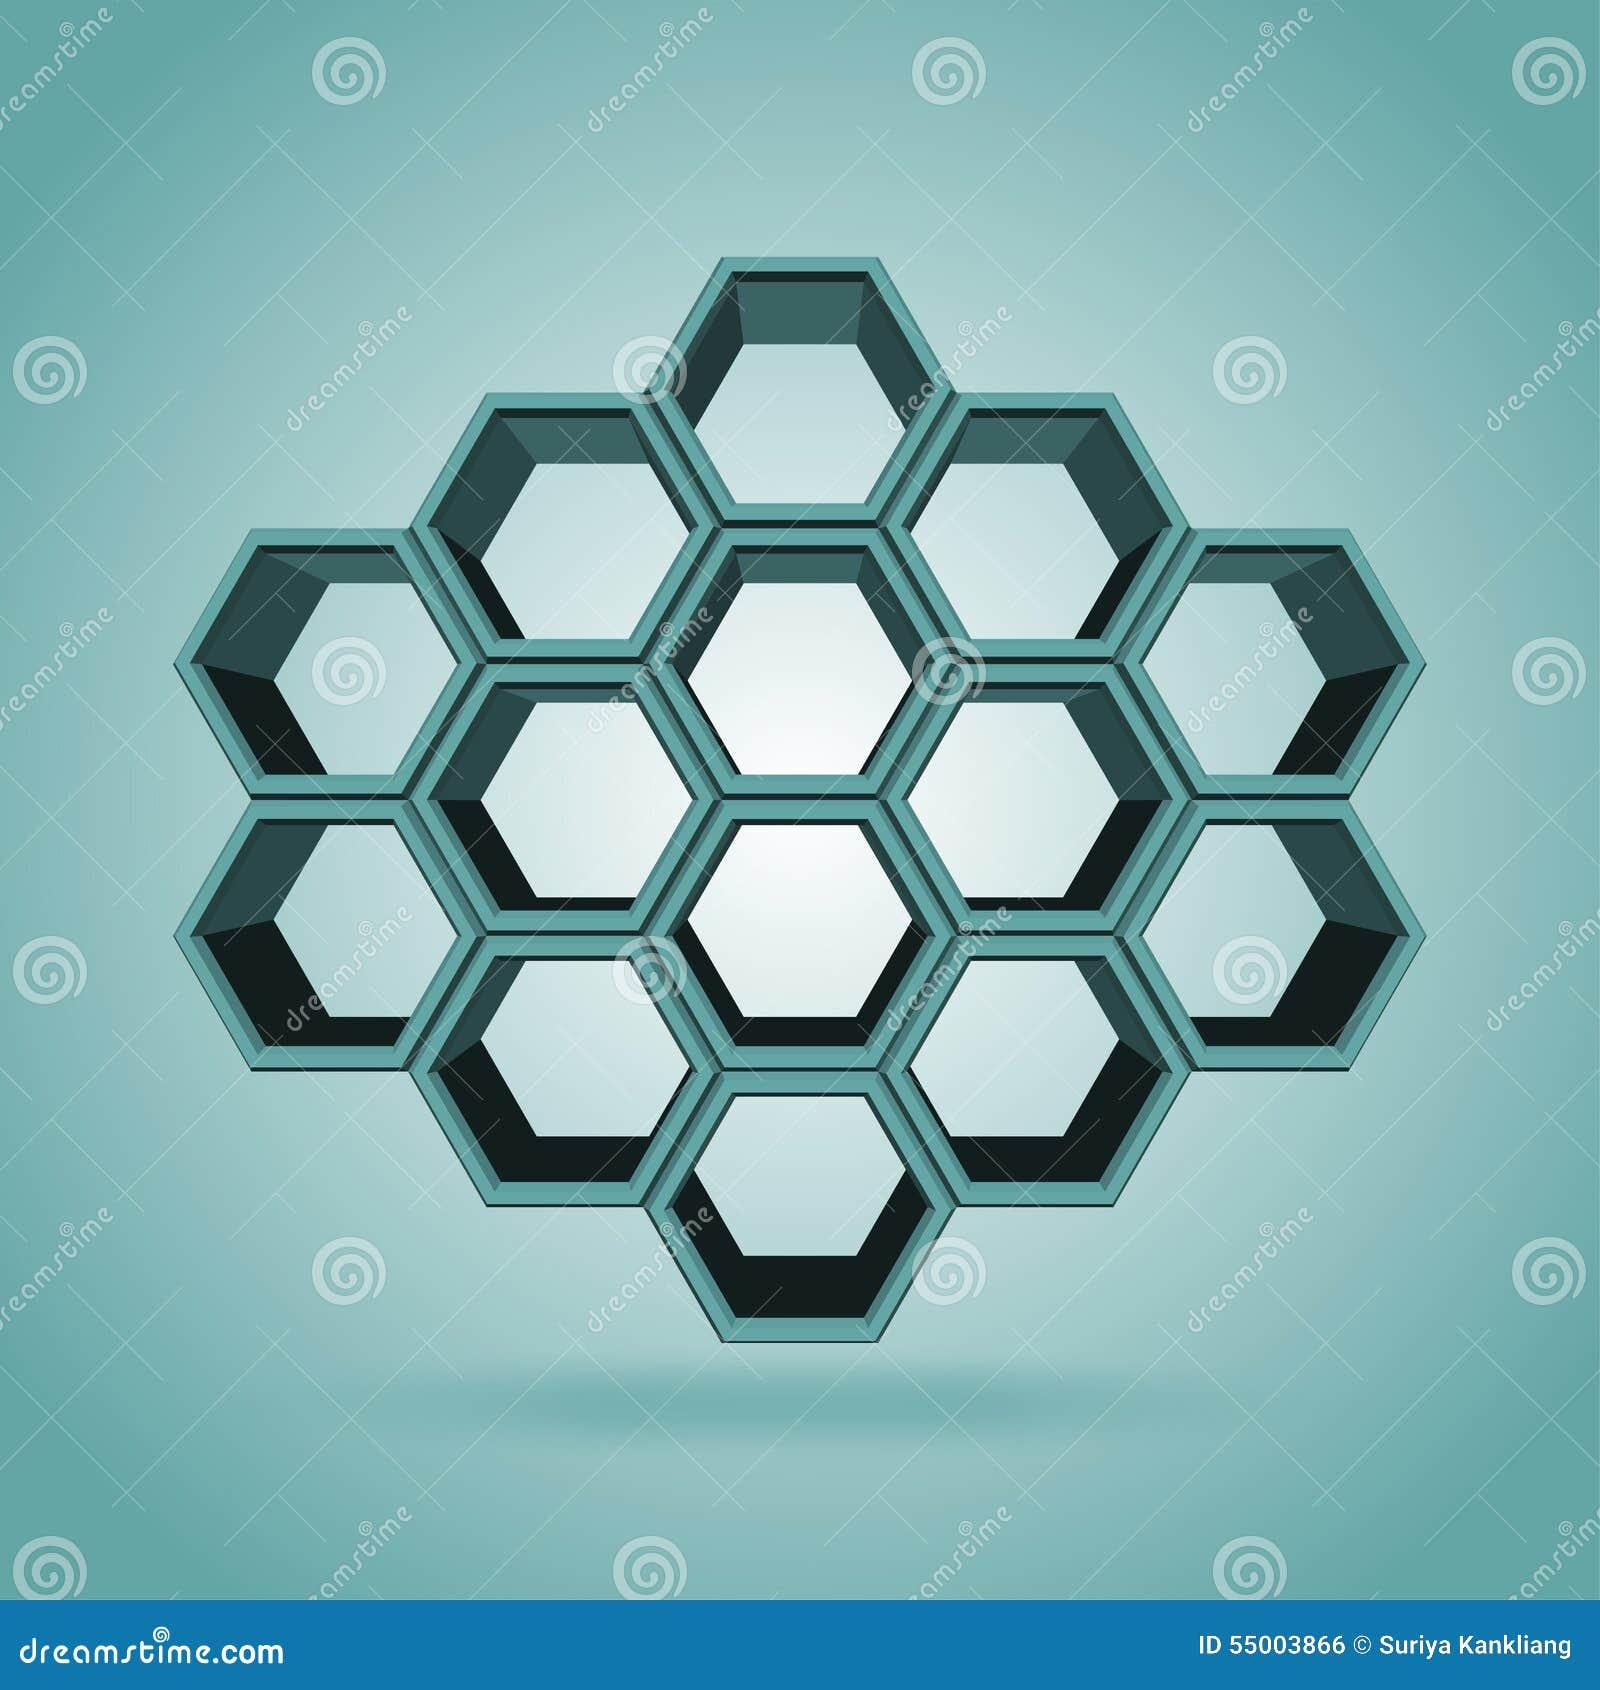 3d hexagon pattern stock vector image 54997696 - 3d Hexagon Pattern Royalty Free Stock Image